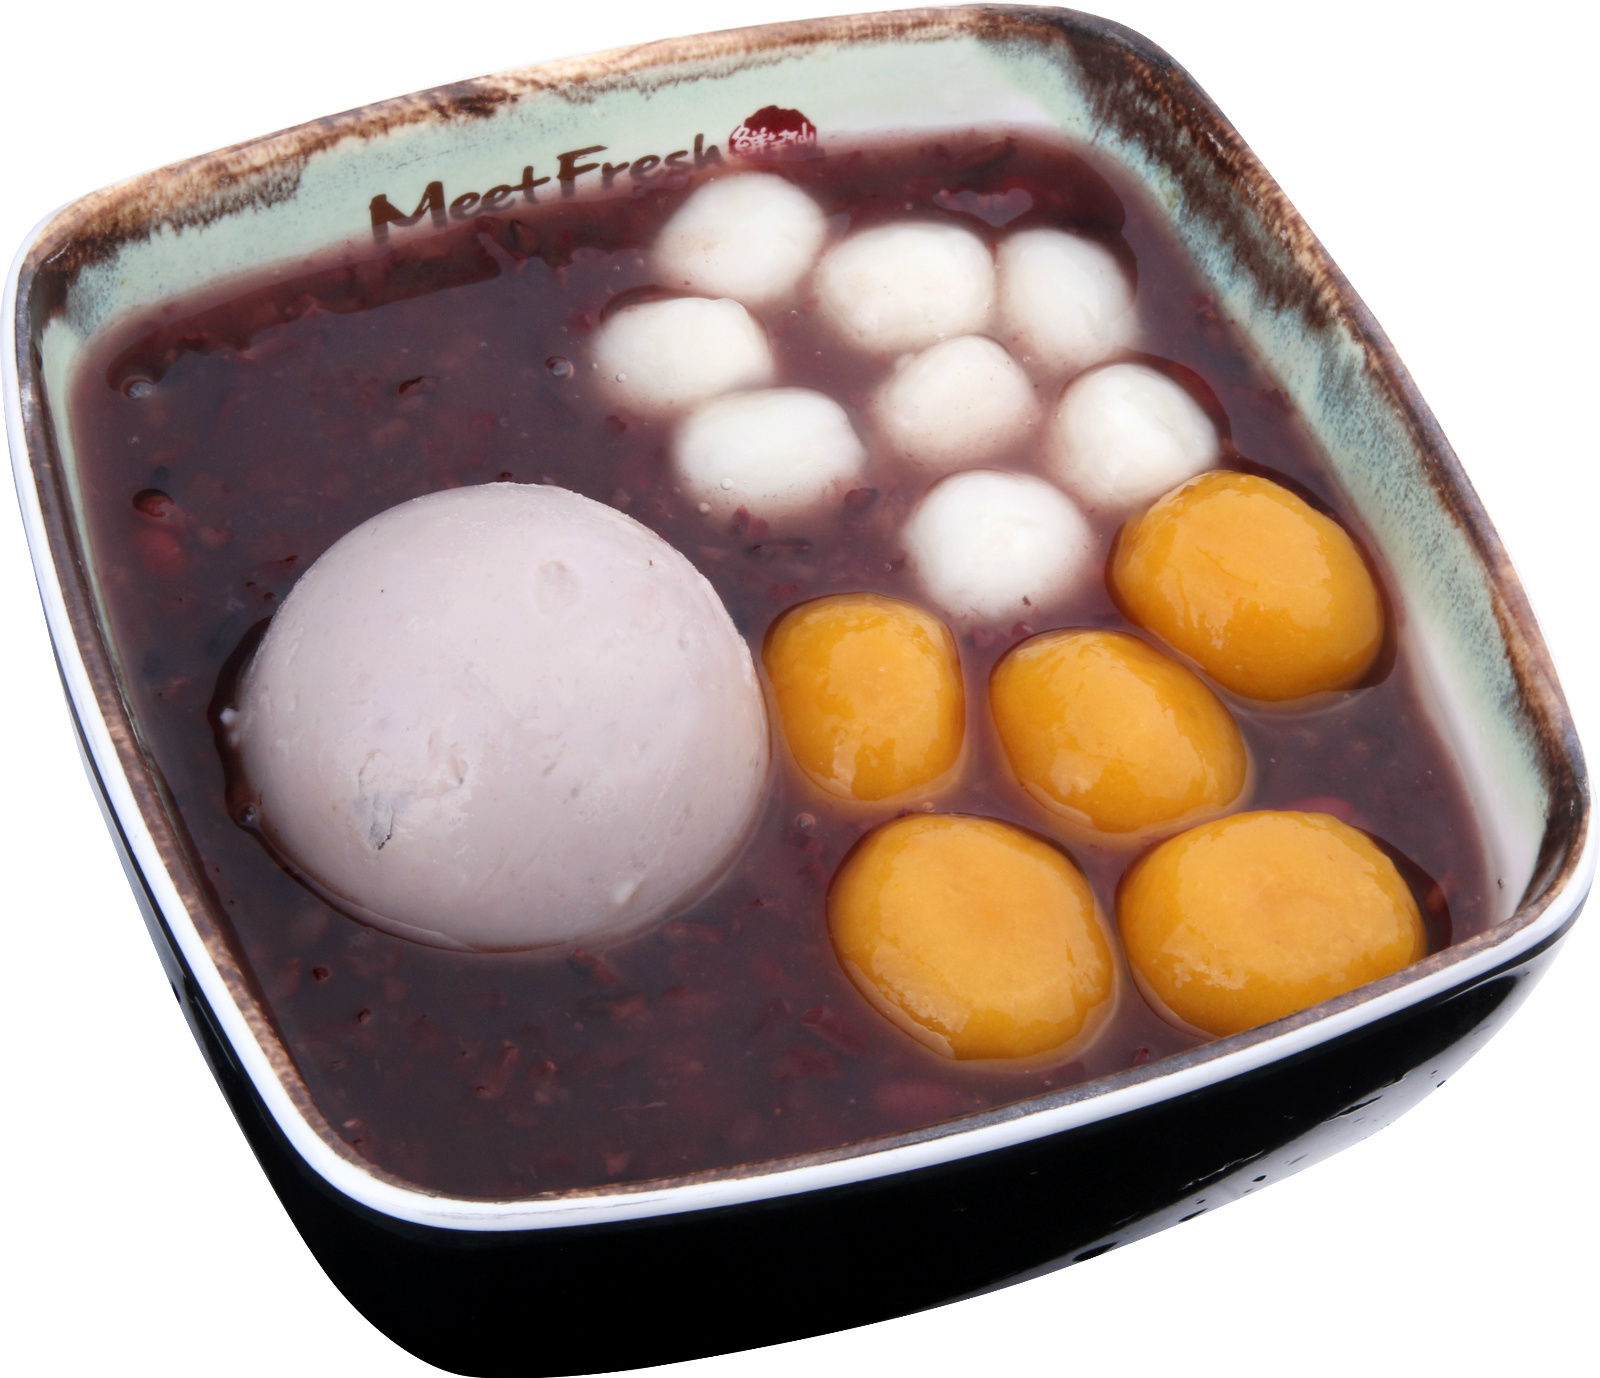 Cold Purple Rice Soup Signature - Taro Paste, Potaro Balls, Rice Balls, Purple Rice Soup